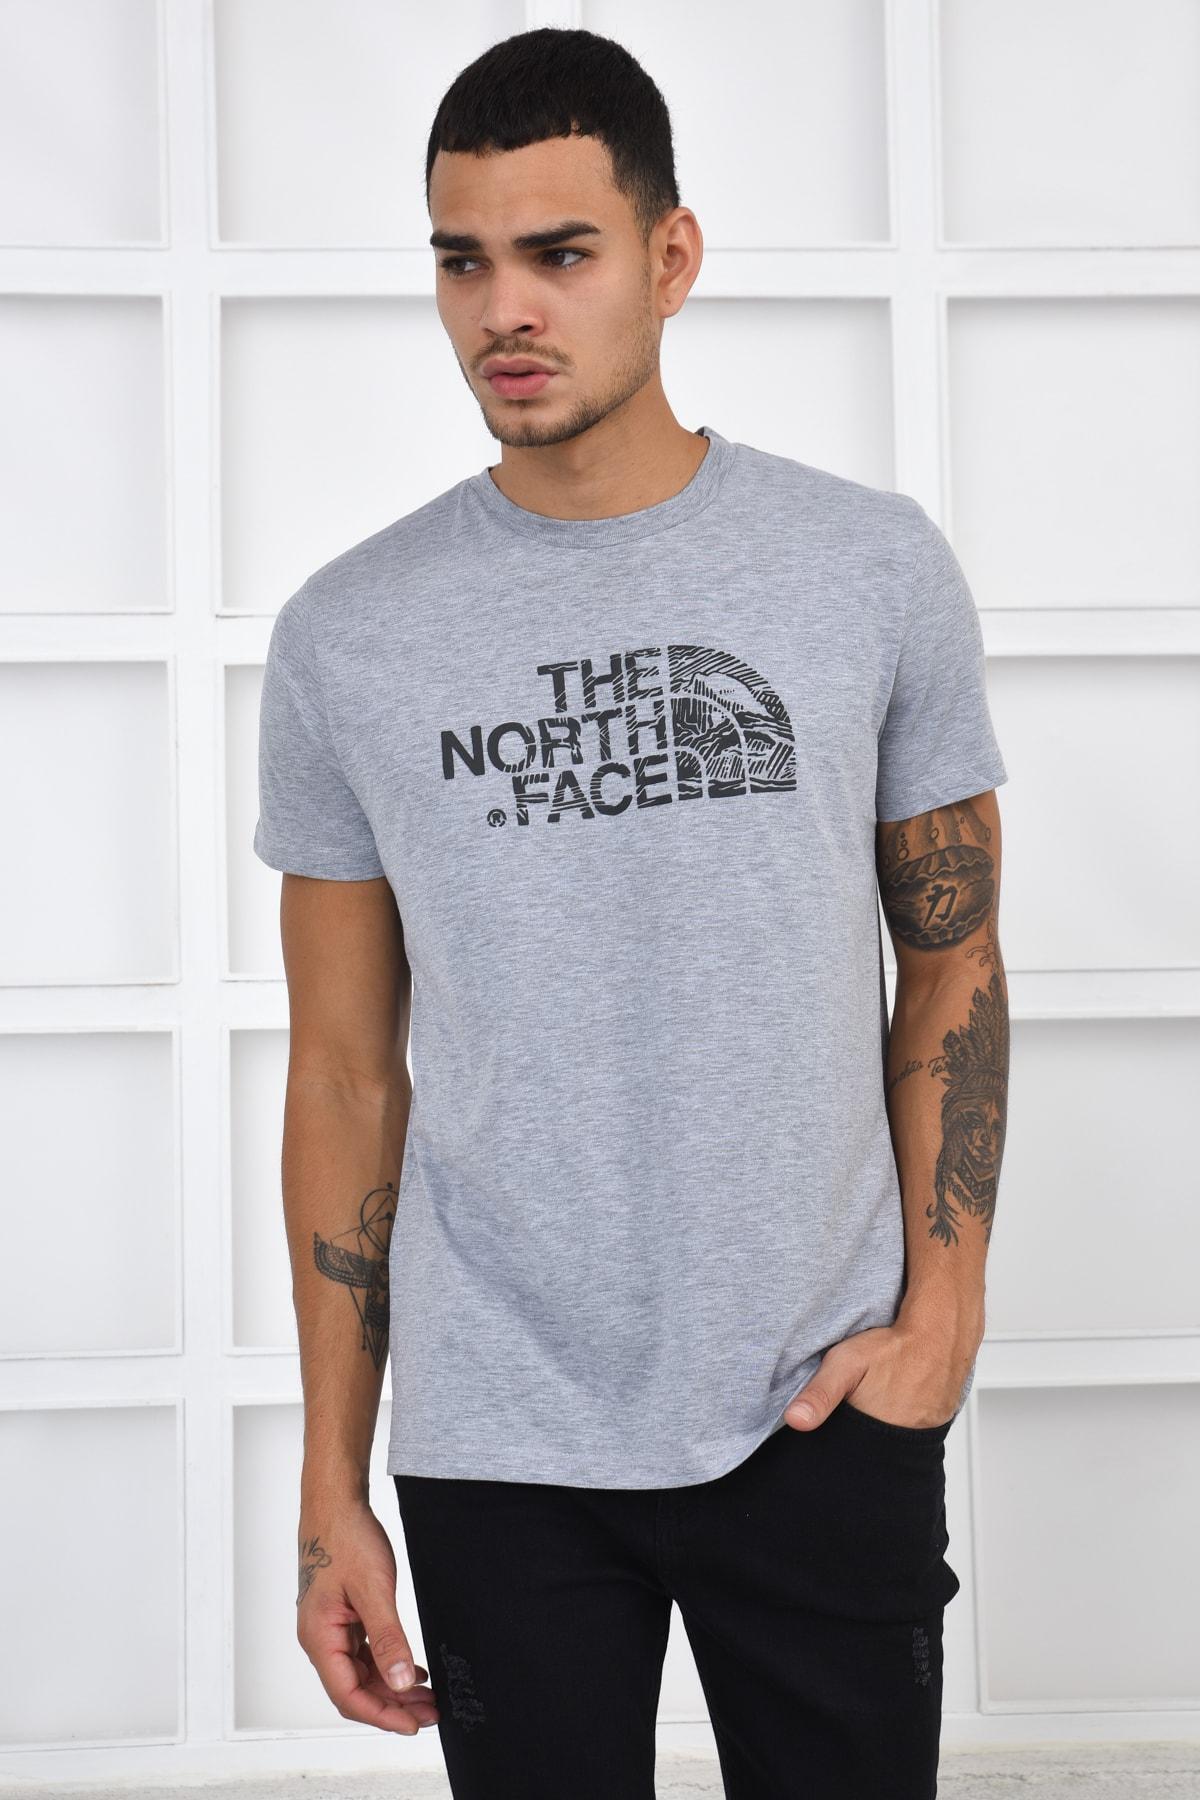 THE NORTH FACE Erkek T-shirt - Gri 1